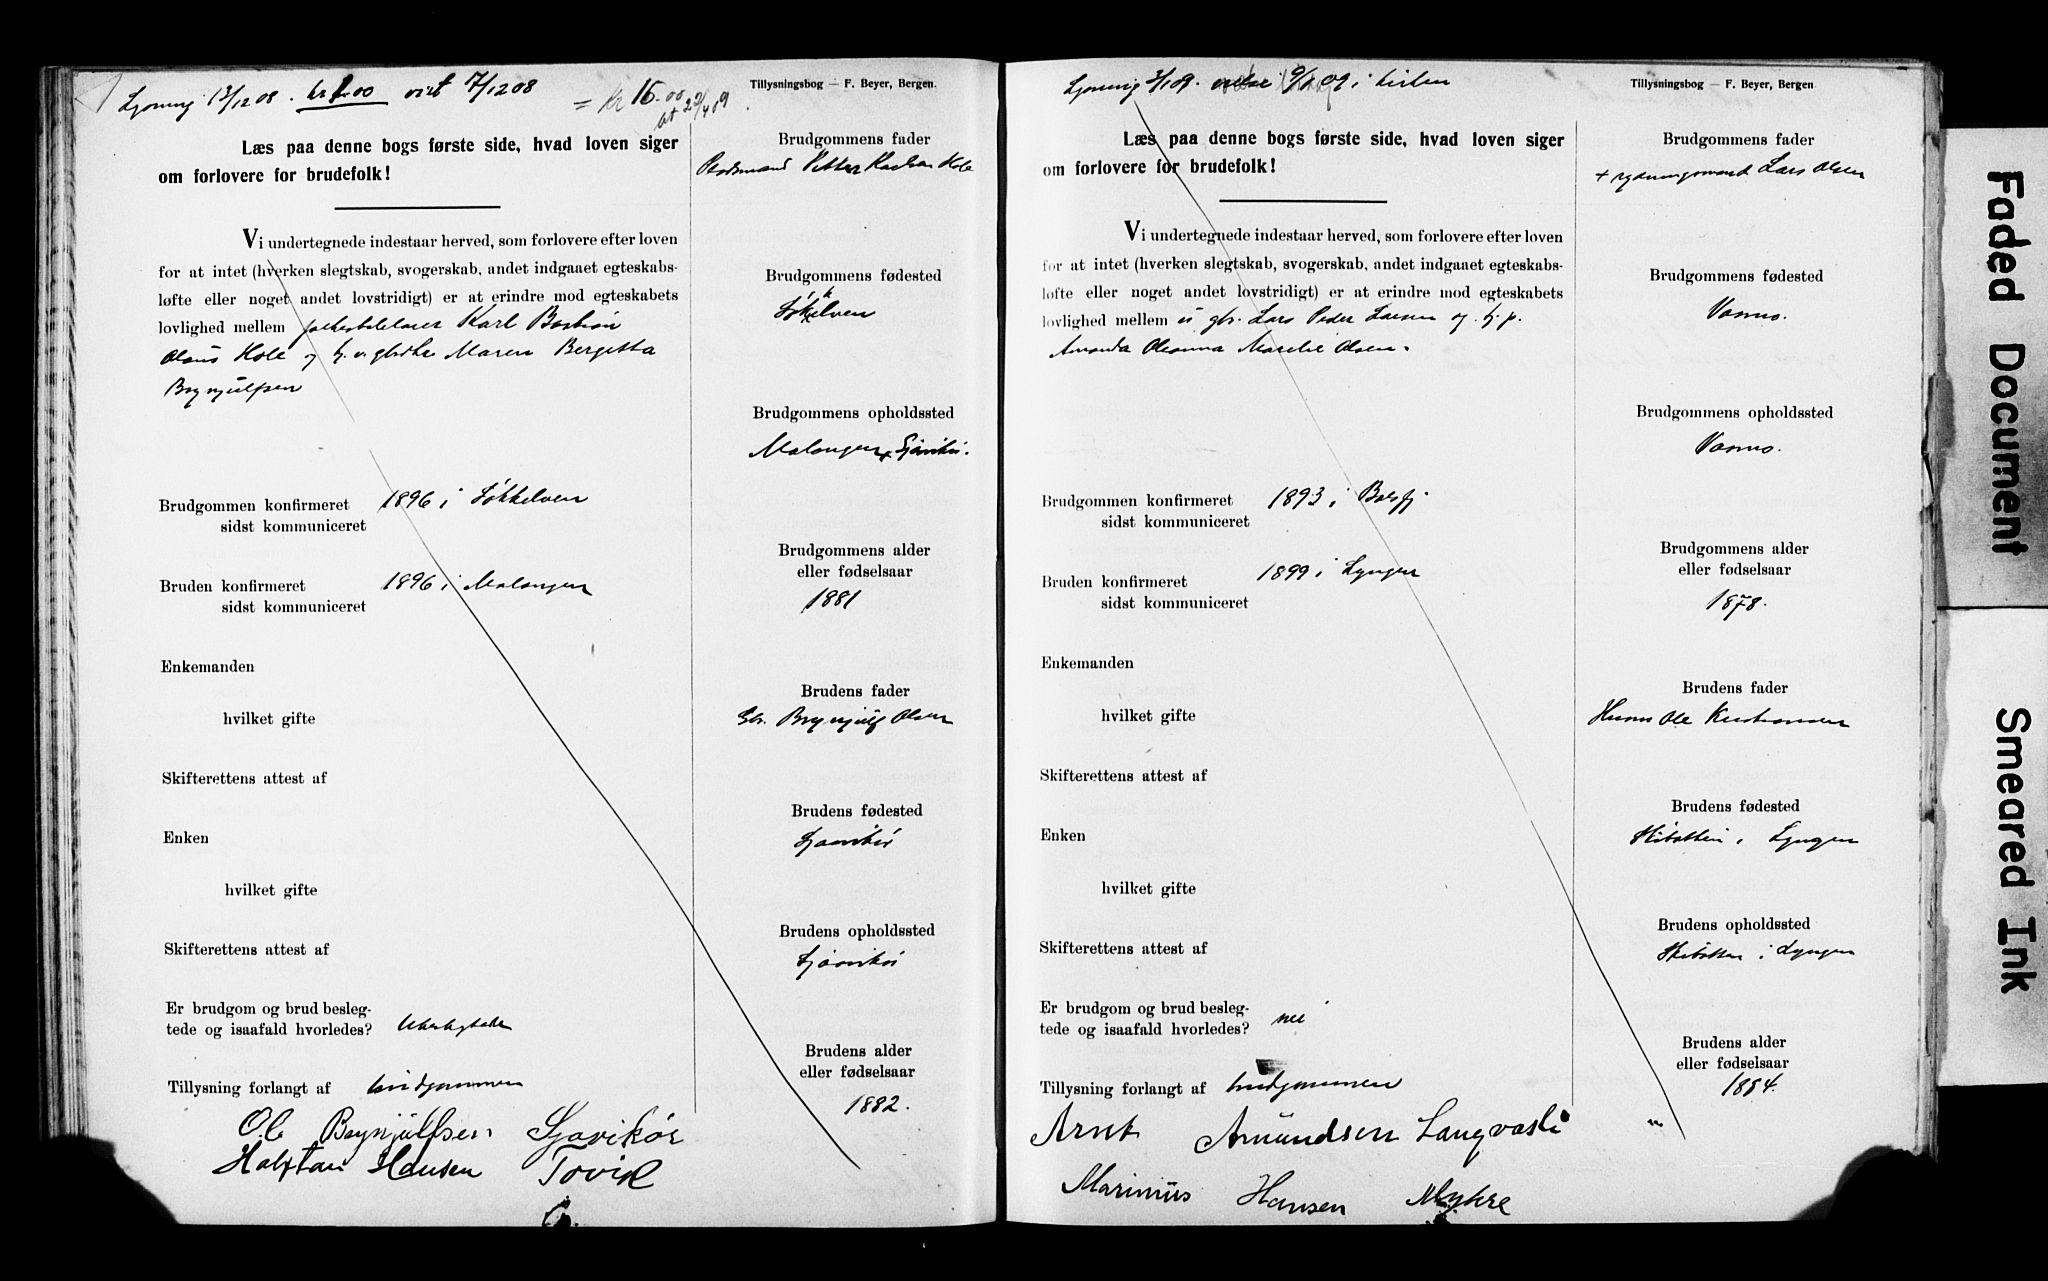 SATØ, Balsfjord sokneprestembete, Banns register no. 32, 1907-1910